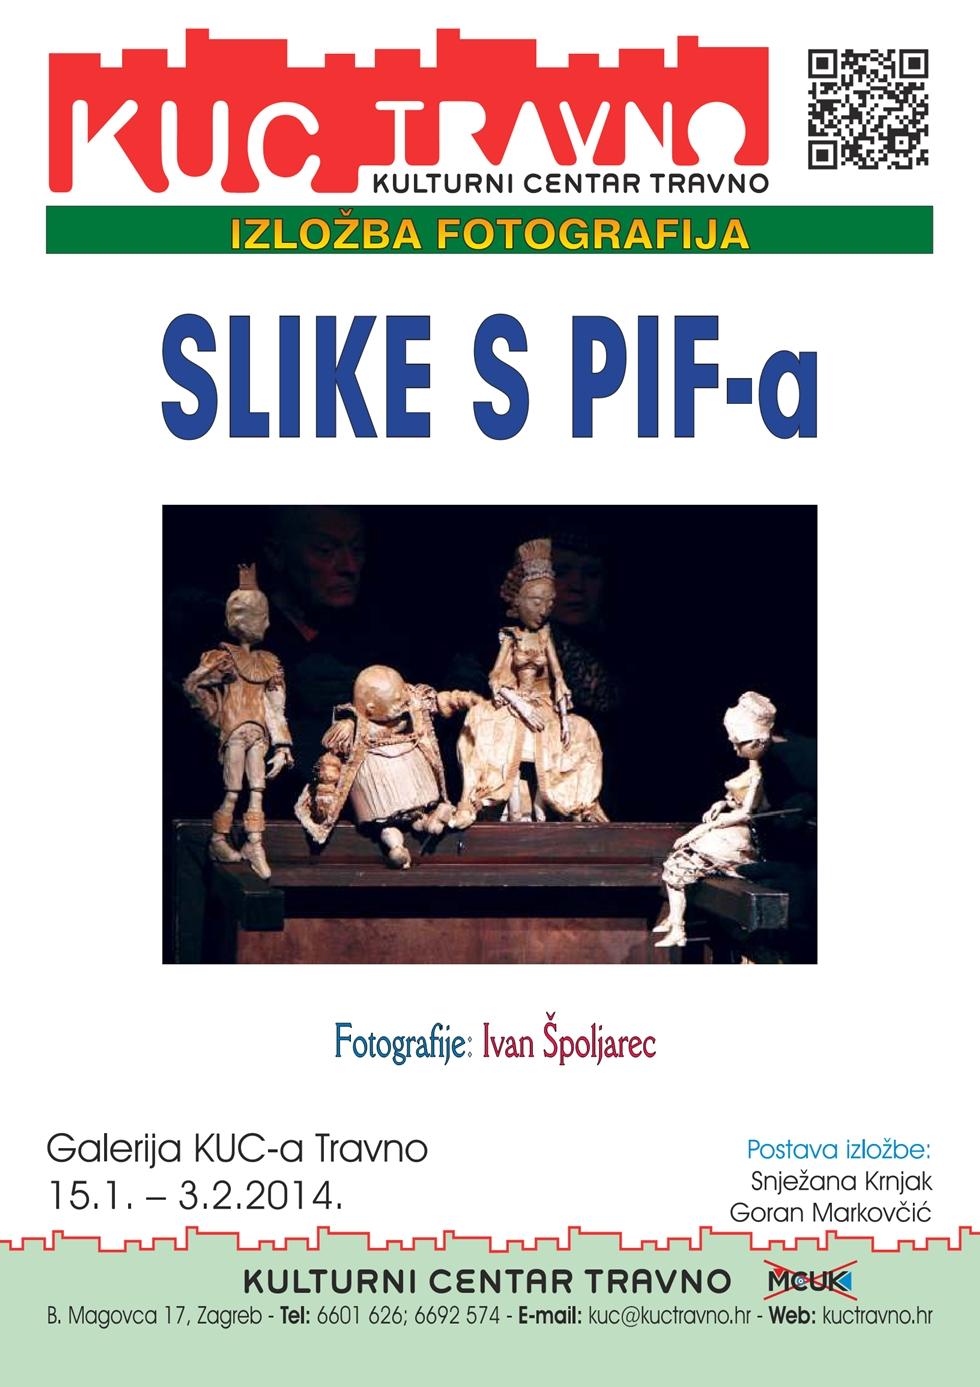 IzlozbaSlikeSPIF-a